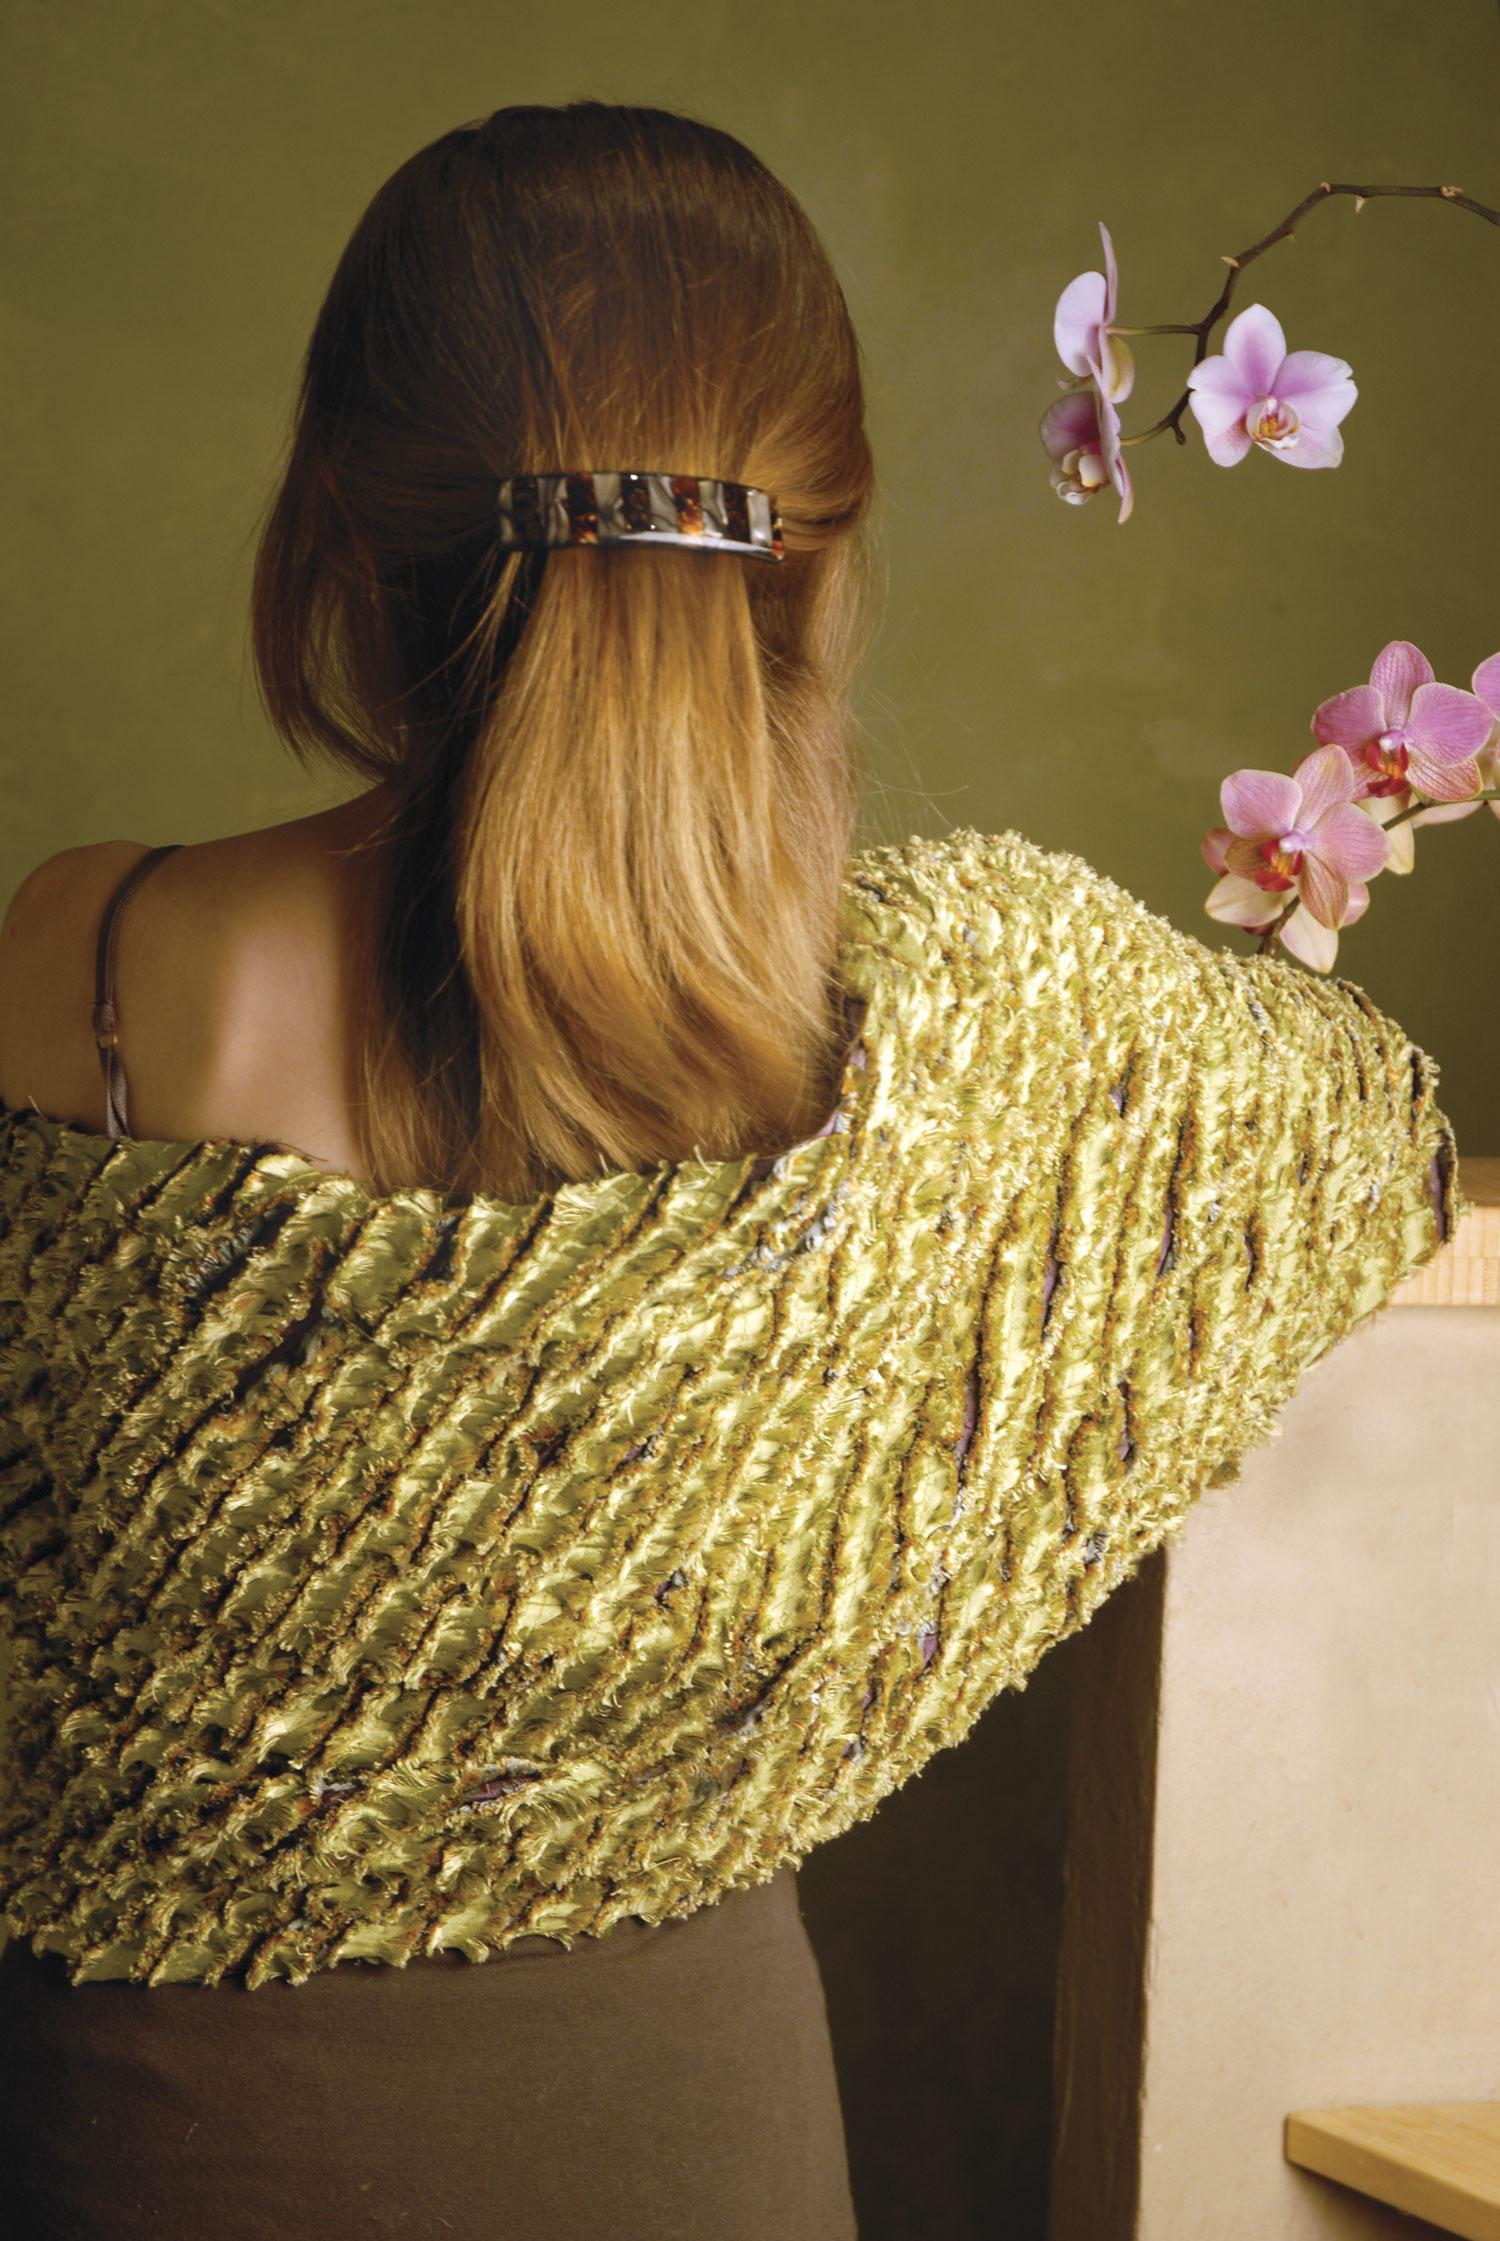 chenille-backview-orchids-2-OP.jpg